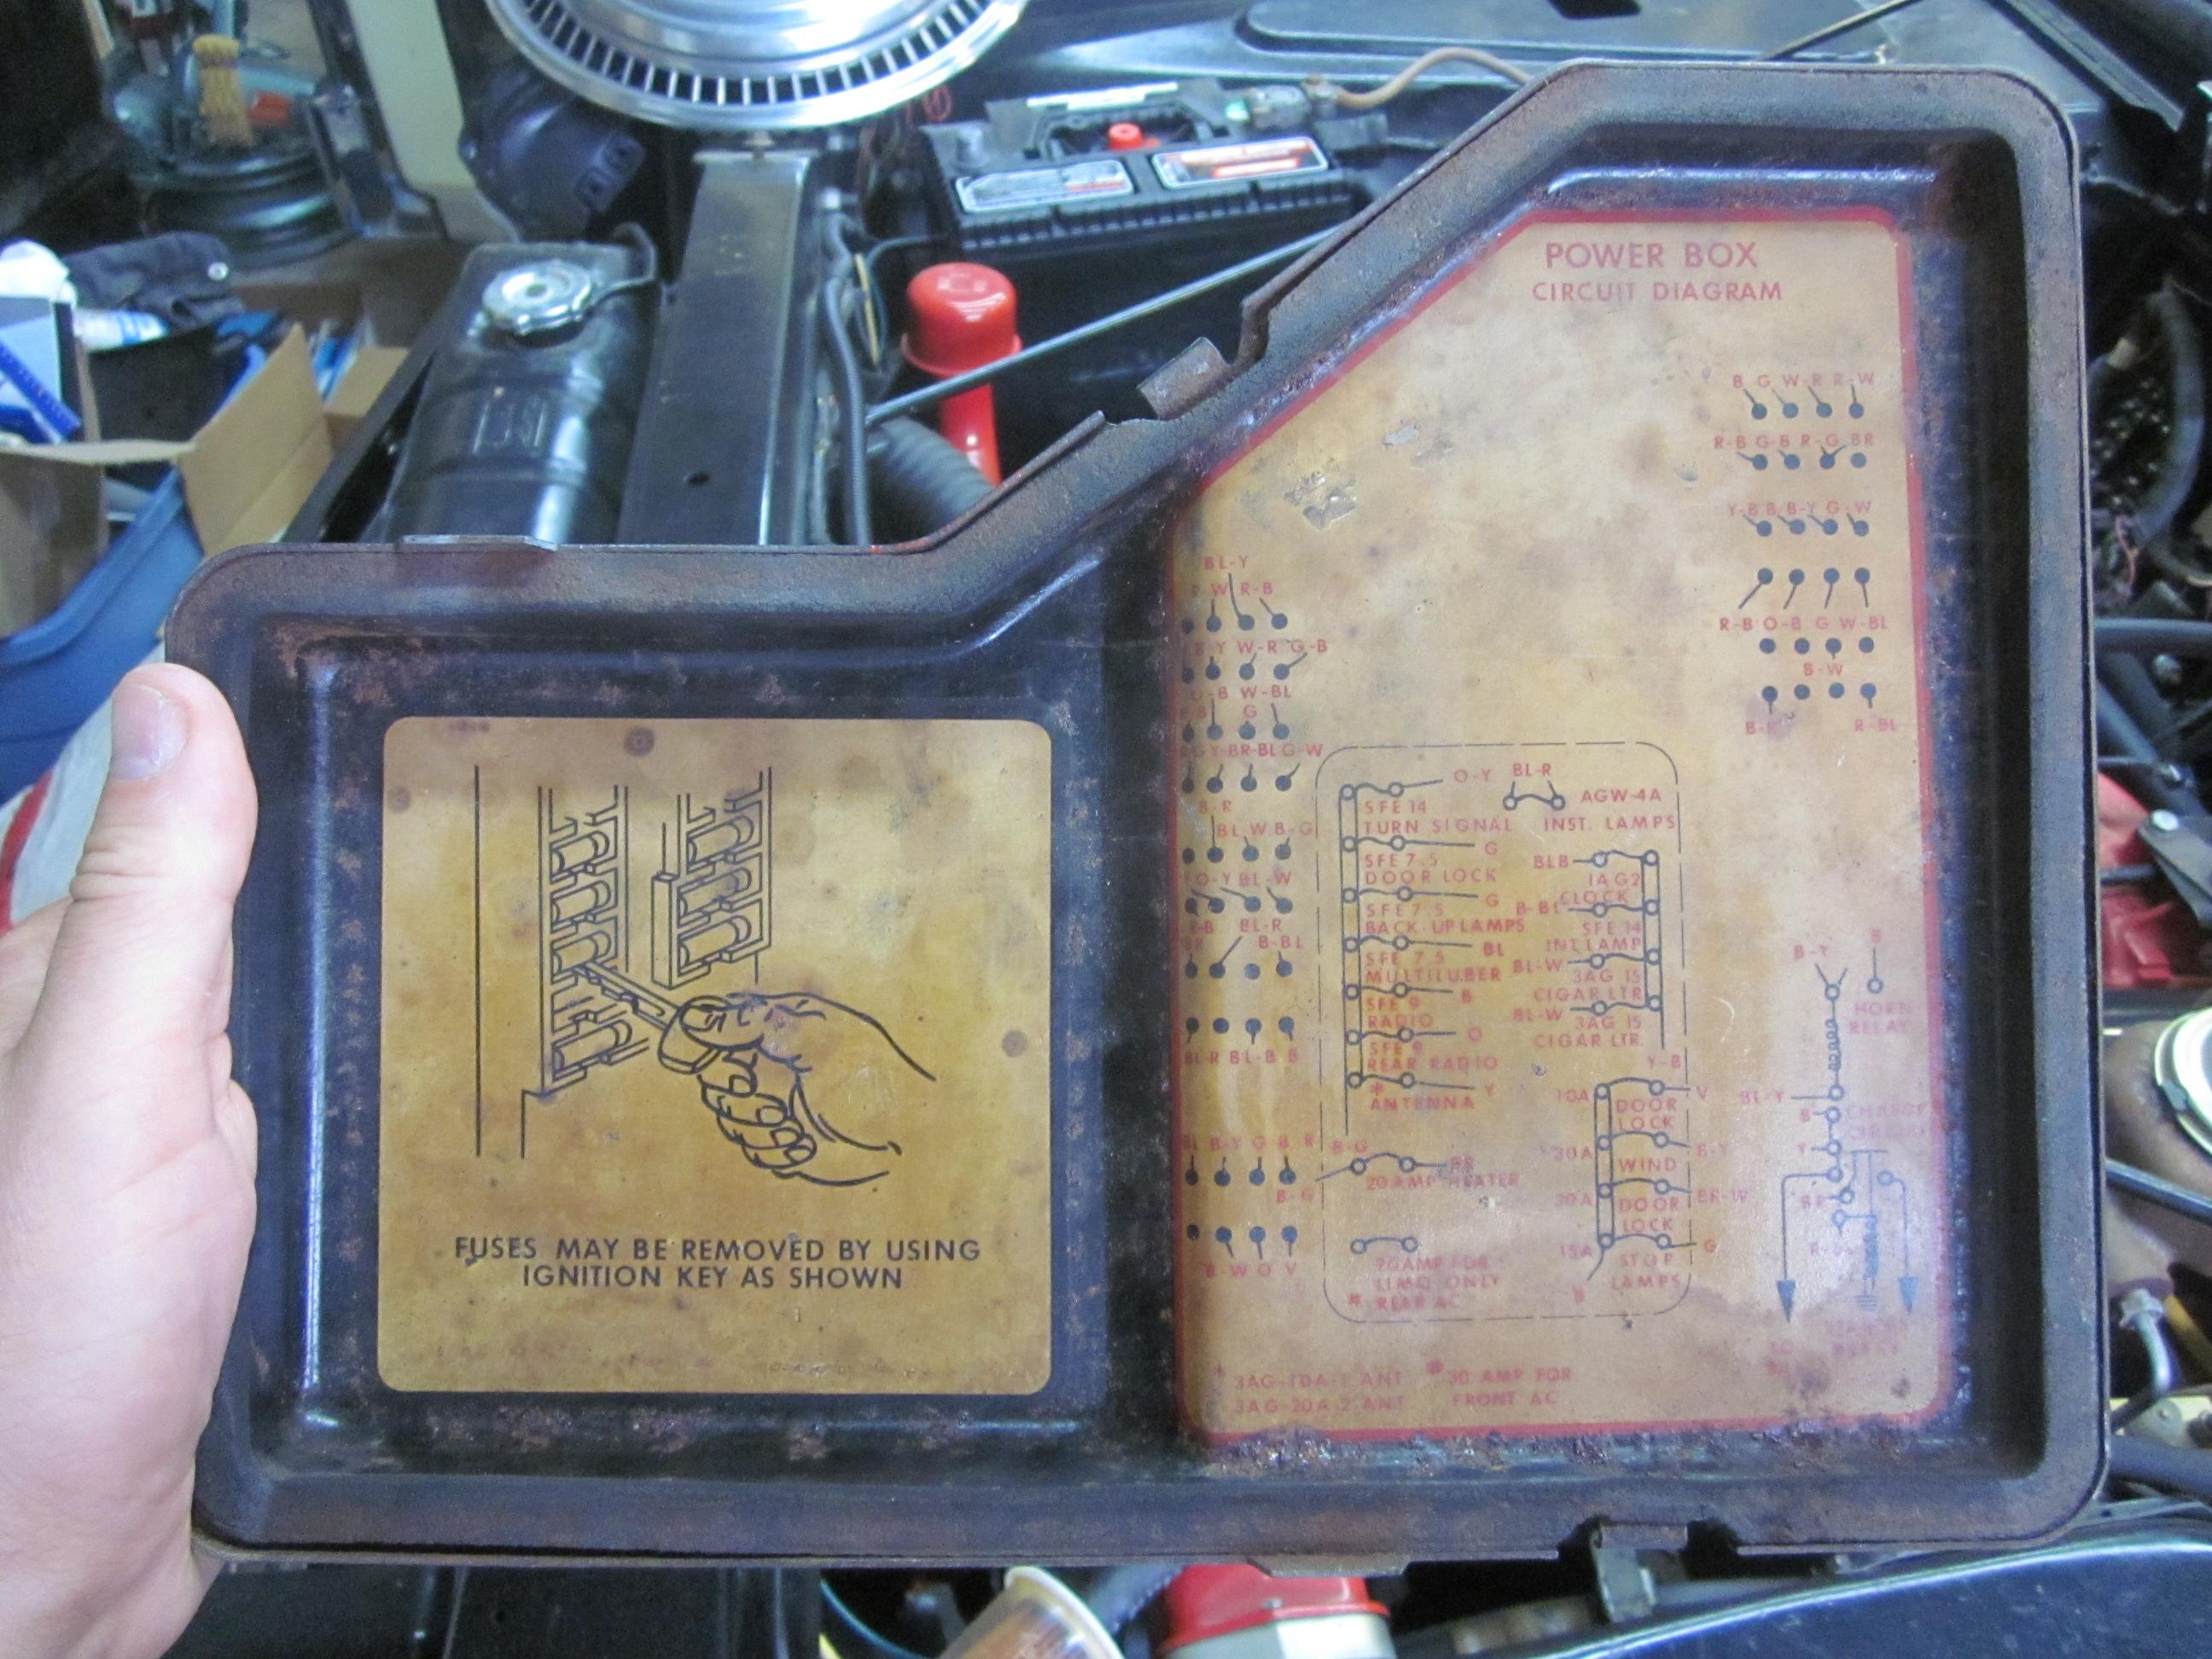 1987 corvette fuse box diagram wiring library [ 2592 x 1944 Pixel ]